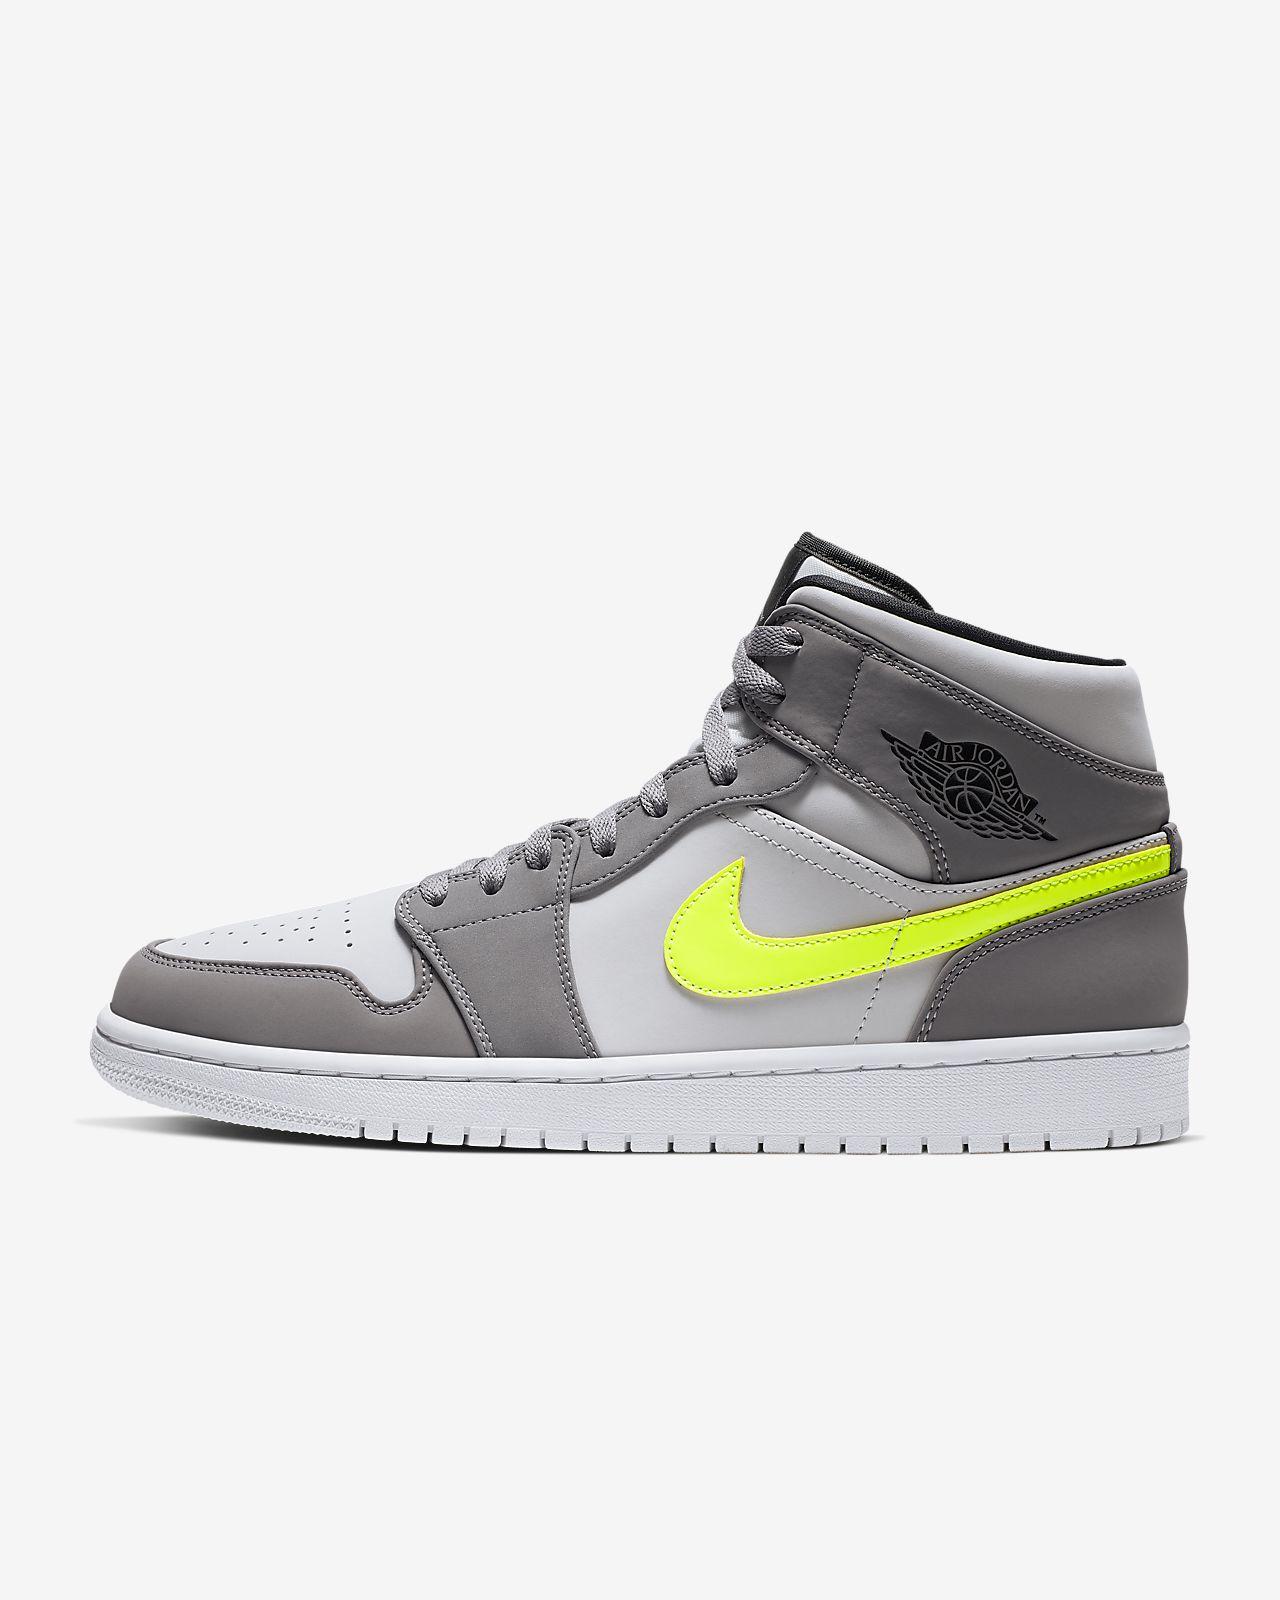 a7b0cf91c0 Air Jordan 1 Mid Men's Shoe